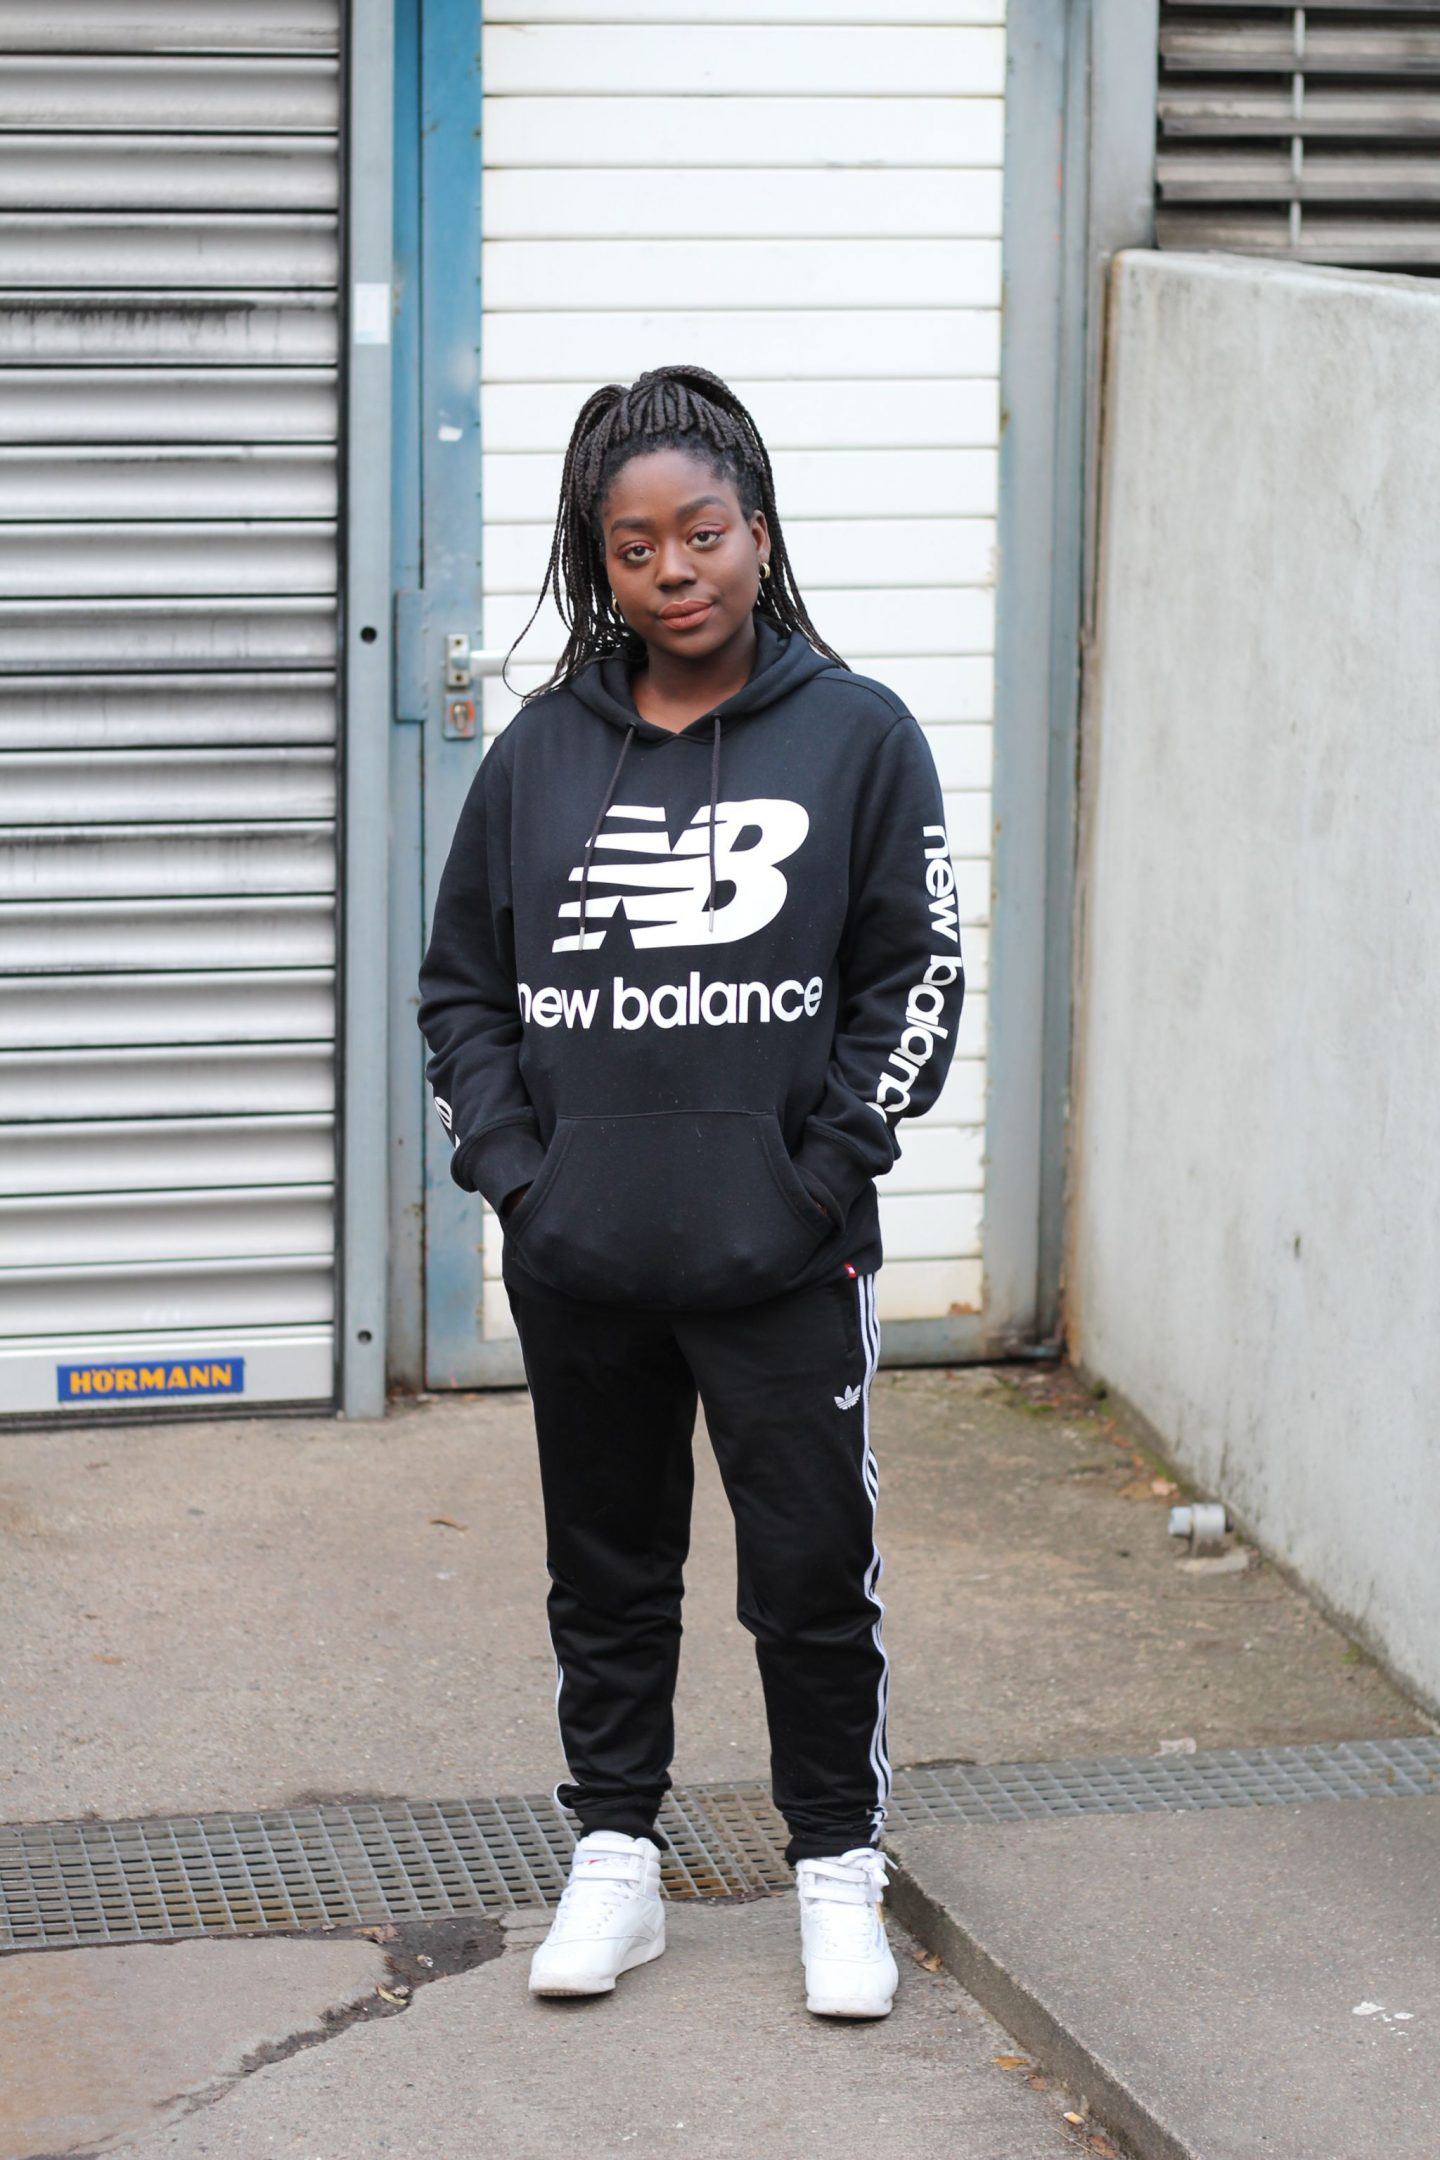 streetwear_chic_reebok_adidas_pants_newbalance_lois_opoku_fashion_blog_style_berlin_lisforlois_